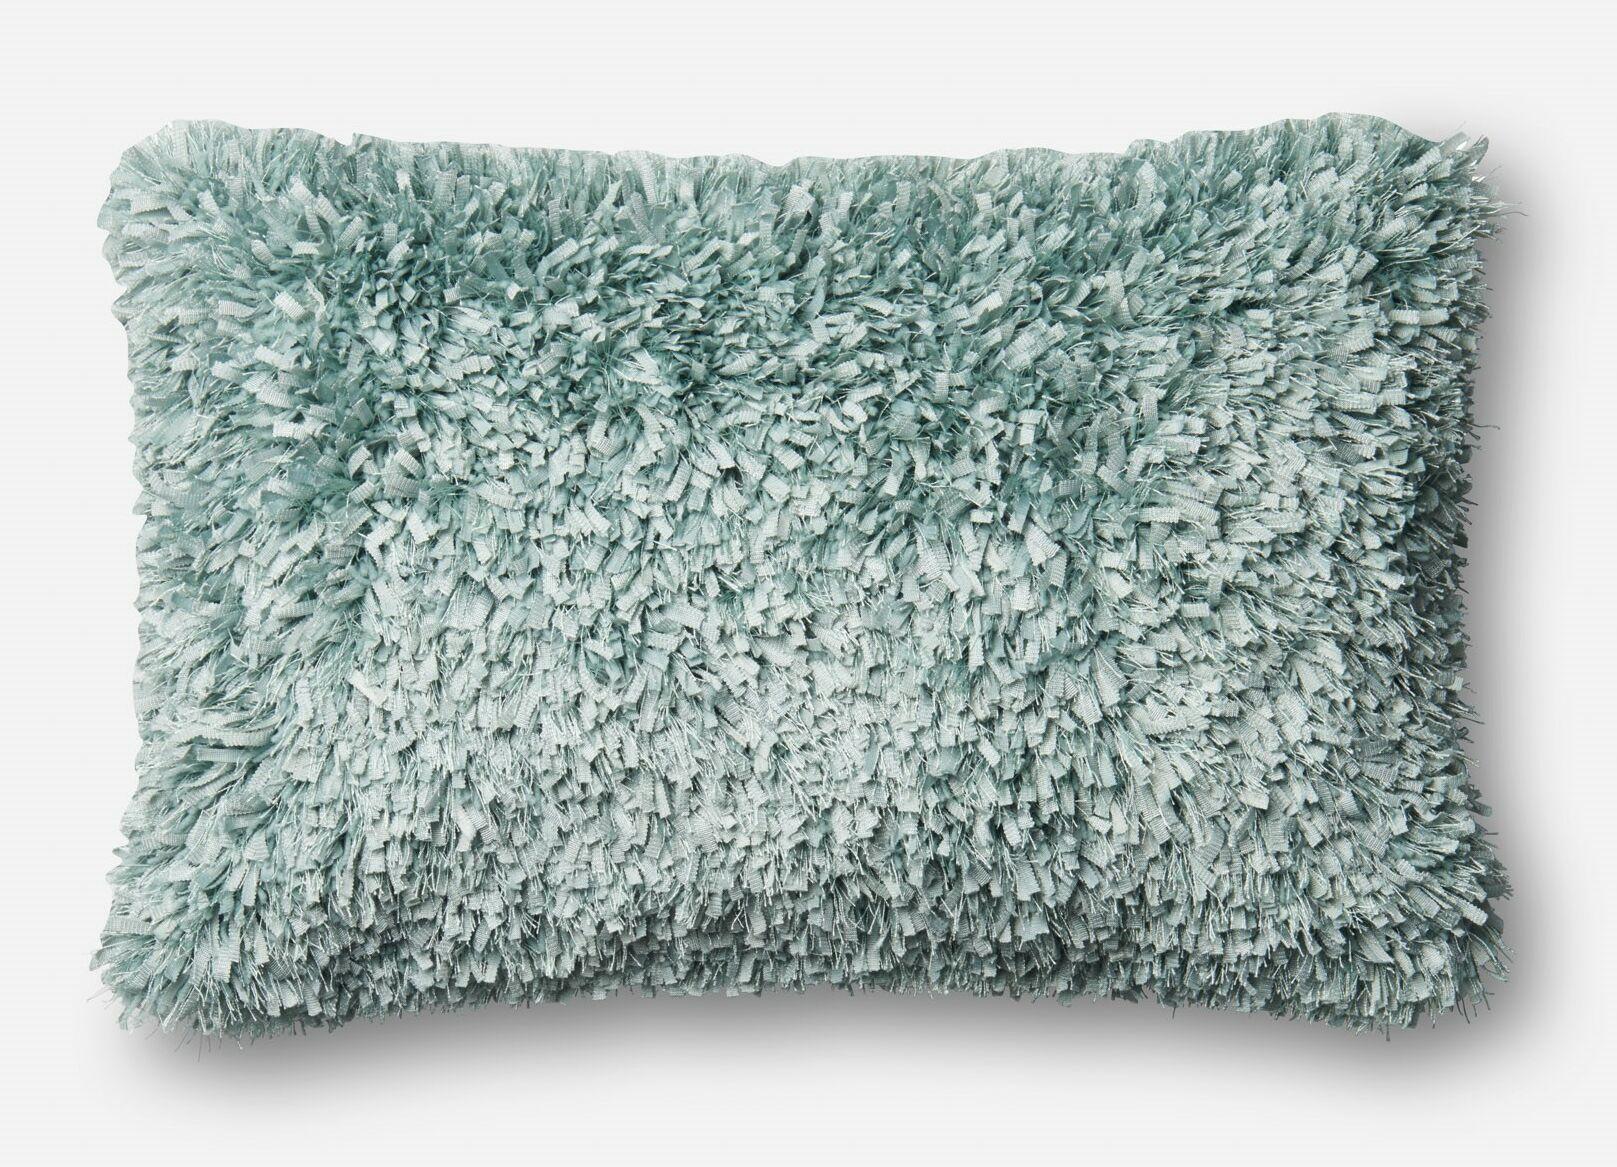 Brookstead Lumbar Pillow Color: Light Blue, Fill Material: Down/Feather, Type: Pillow